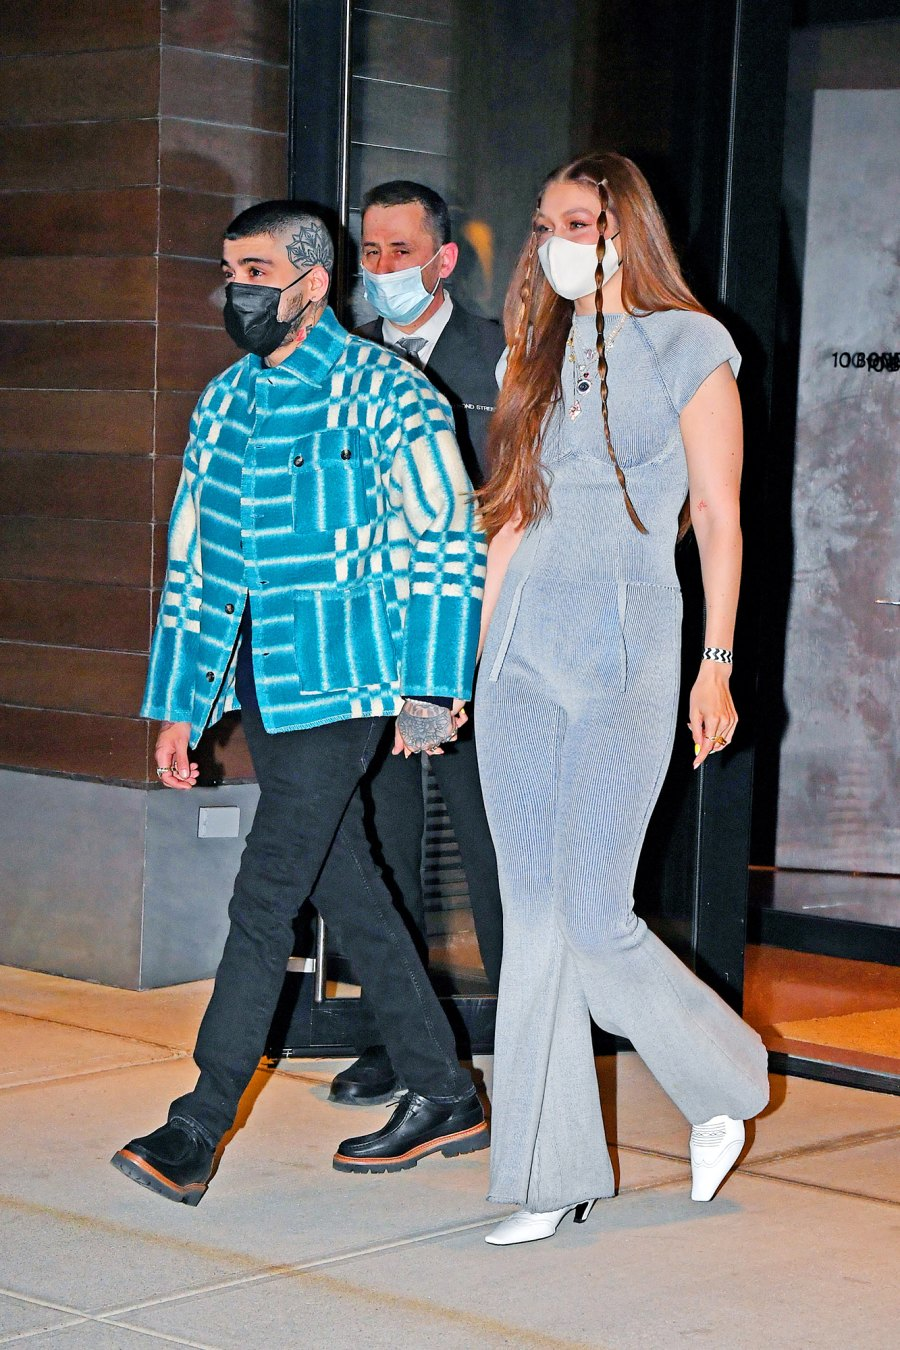 Gigi Hadid Celebrates Her Birthday With Zayn Malik and Bella Hadid in New York City